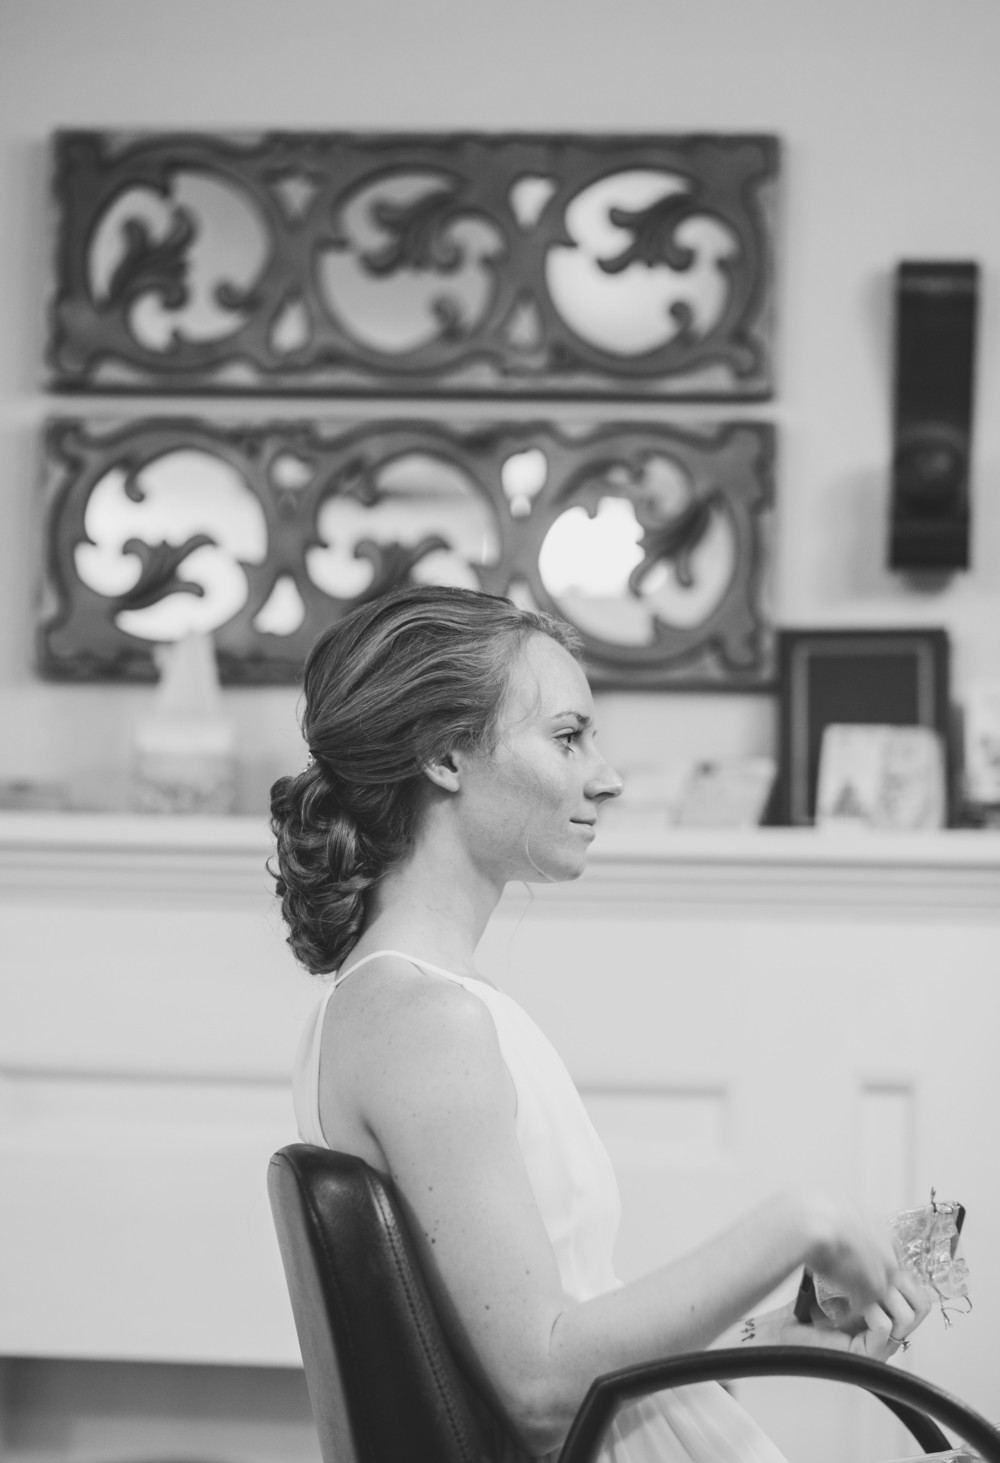 ATGI_Nicole & Patrick Wedding_2016_2S8A6106.jpg